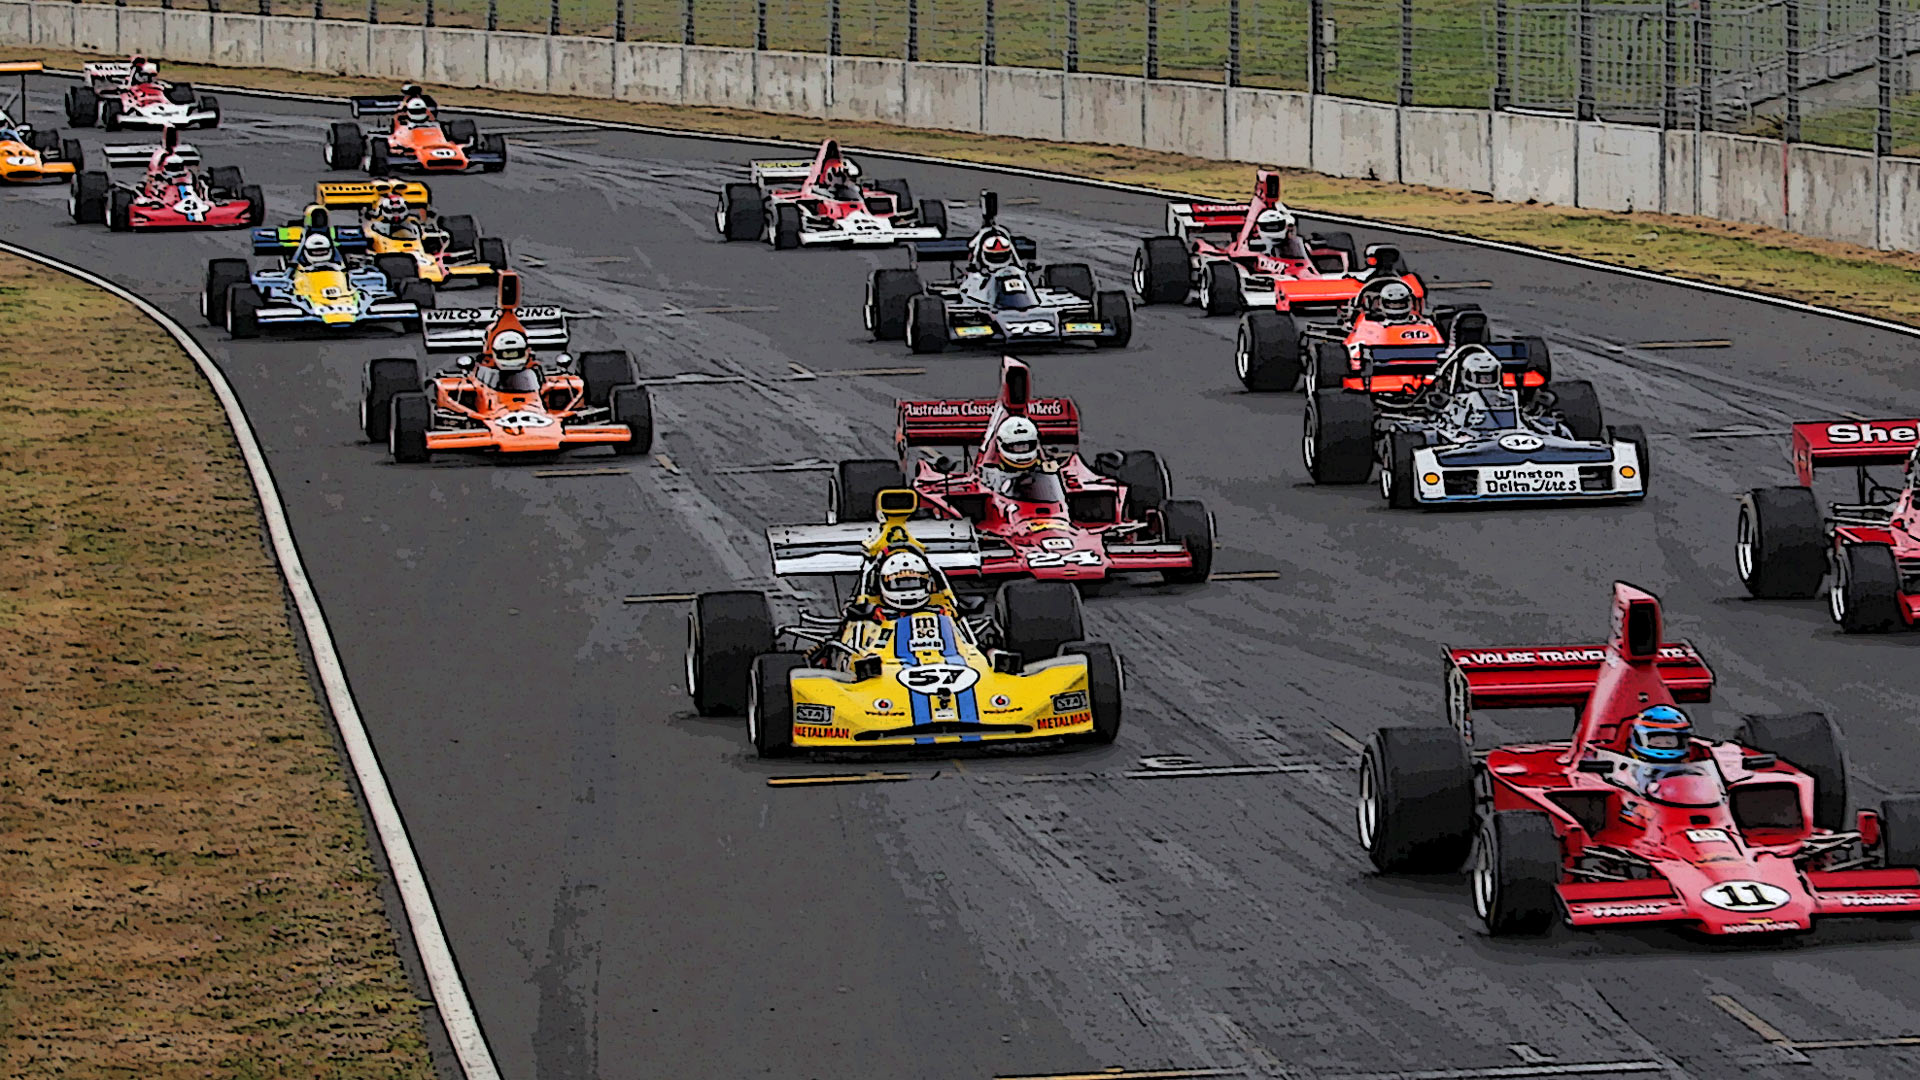 For Sale - F5000 - New Zealand Formula 5000 Official Website